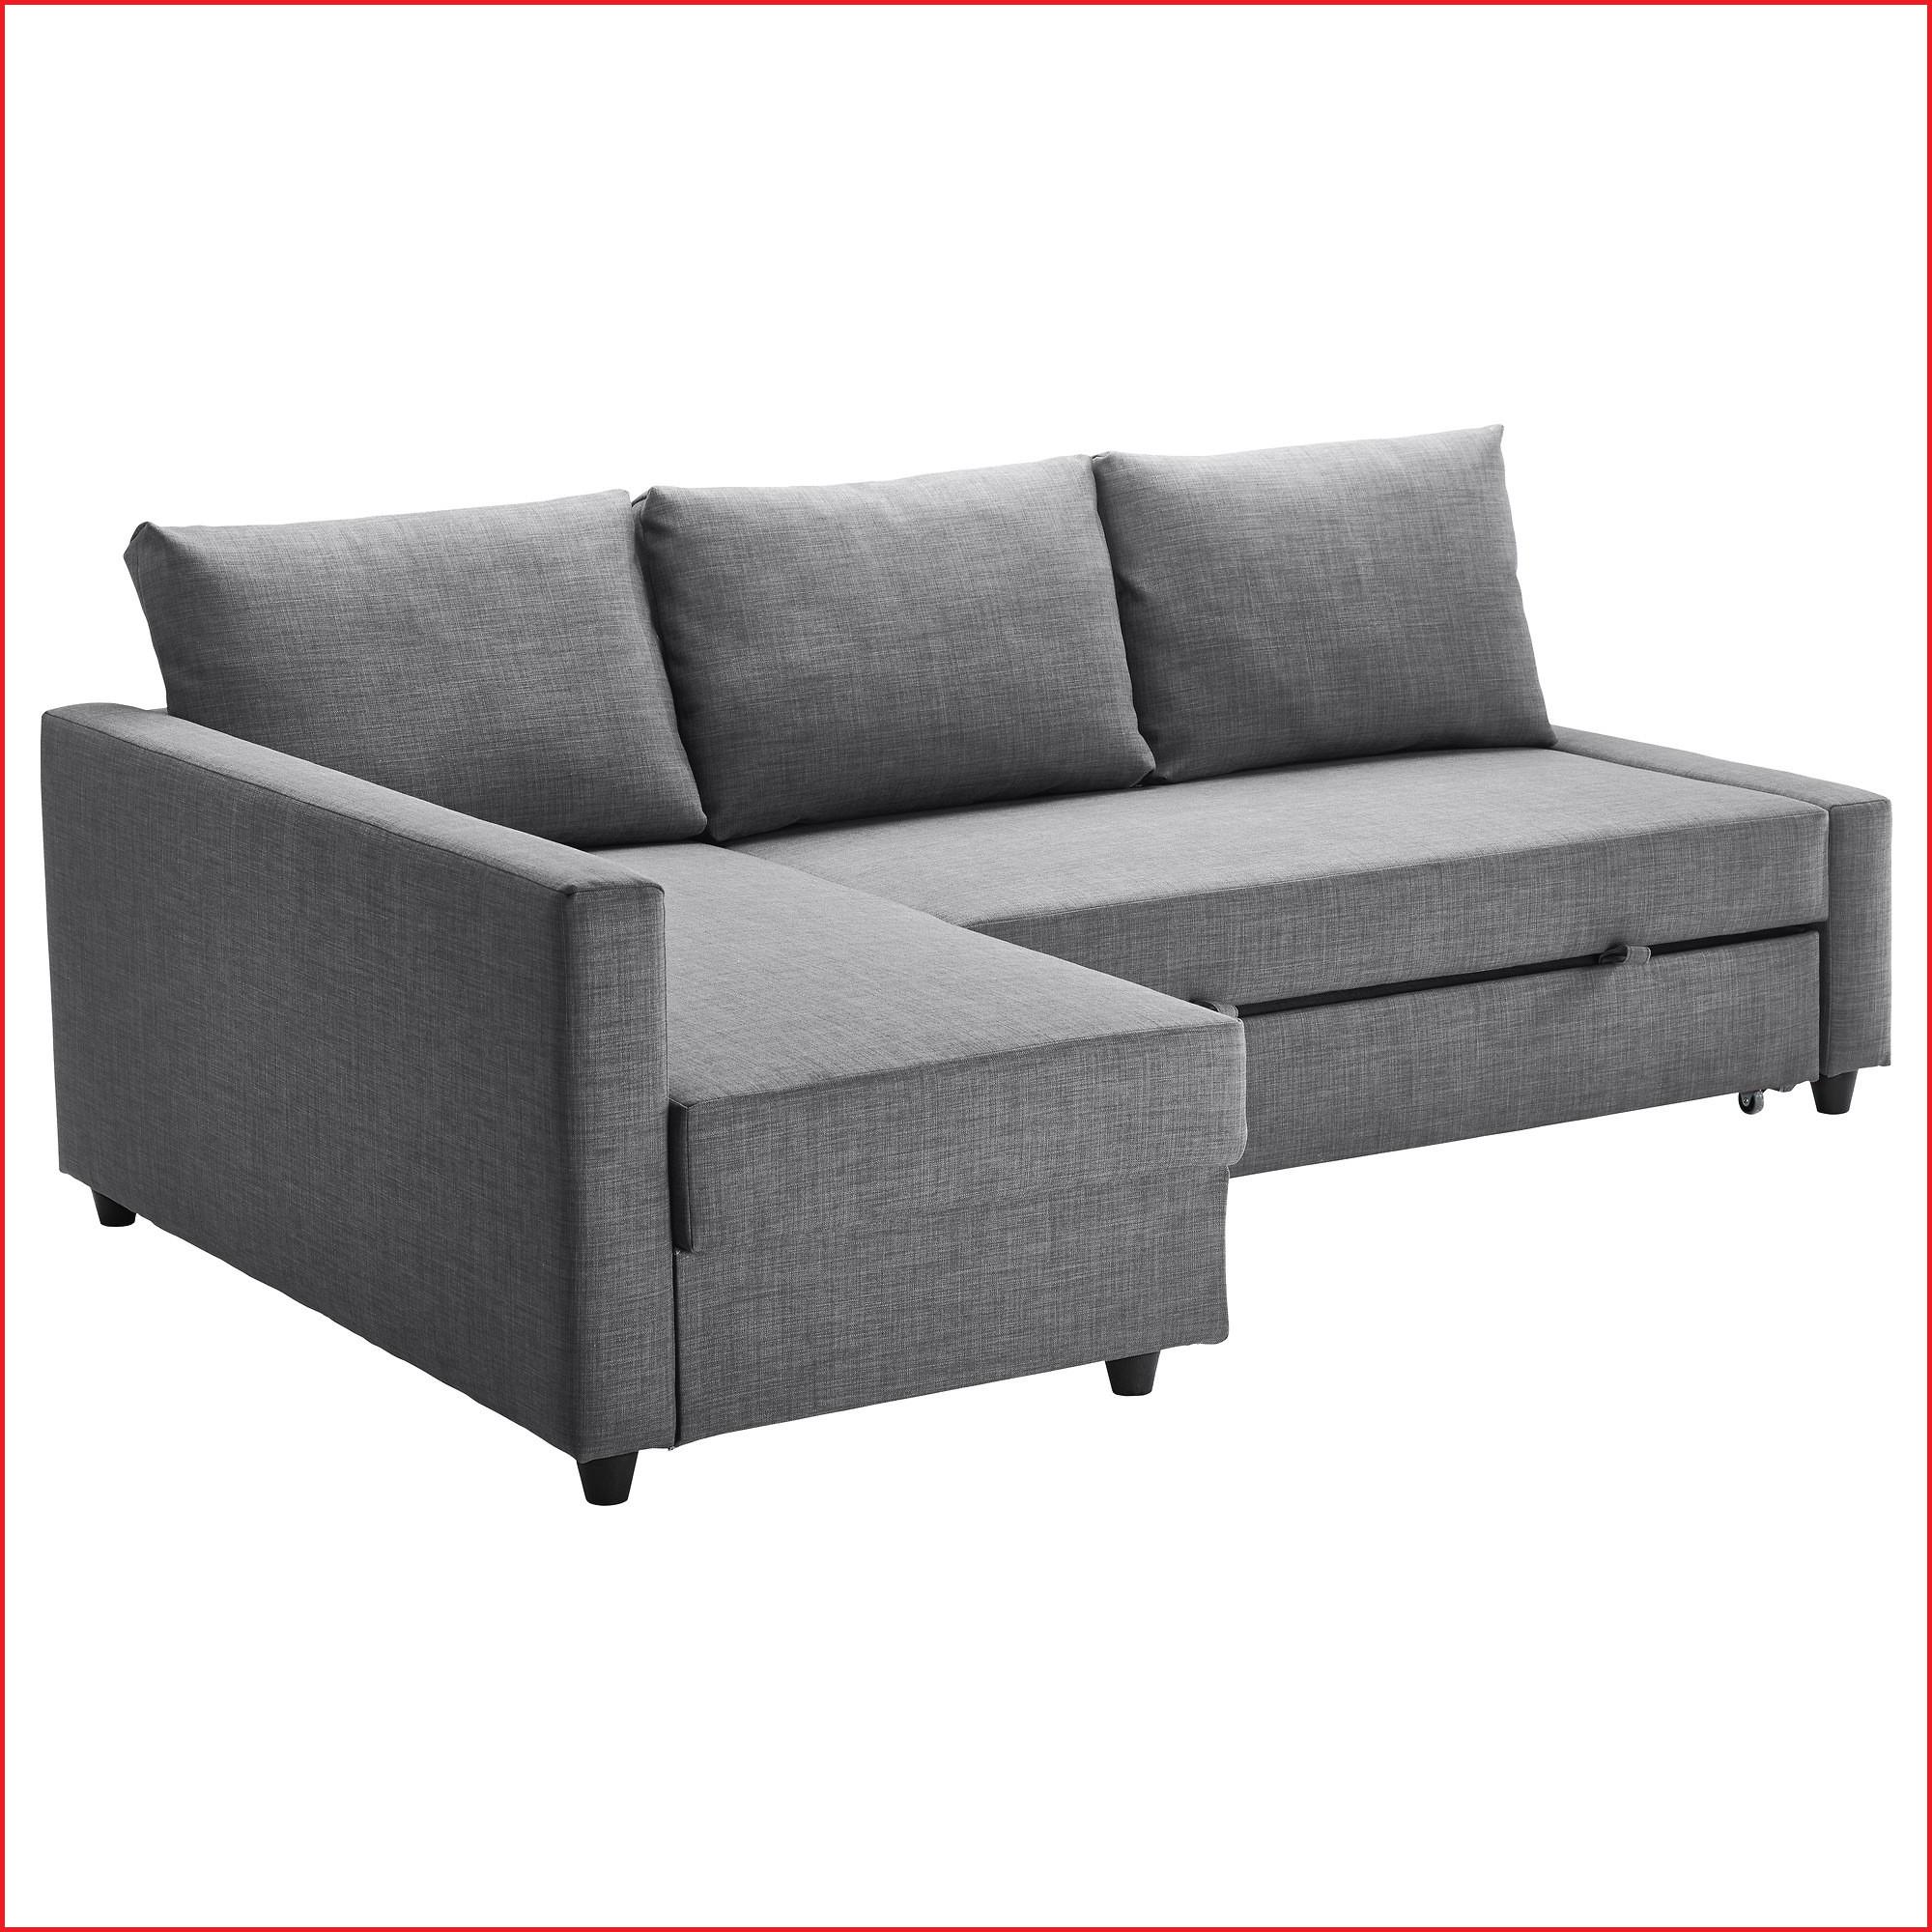 Carrefour sofas Cama Kvdd sofas Cama En Carrefour sofa Cama Ikea Unmiset